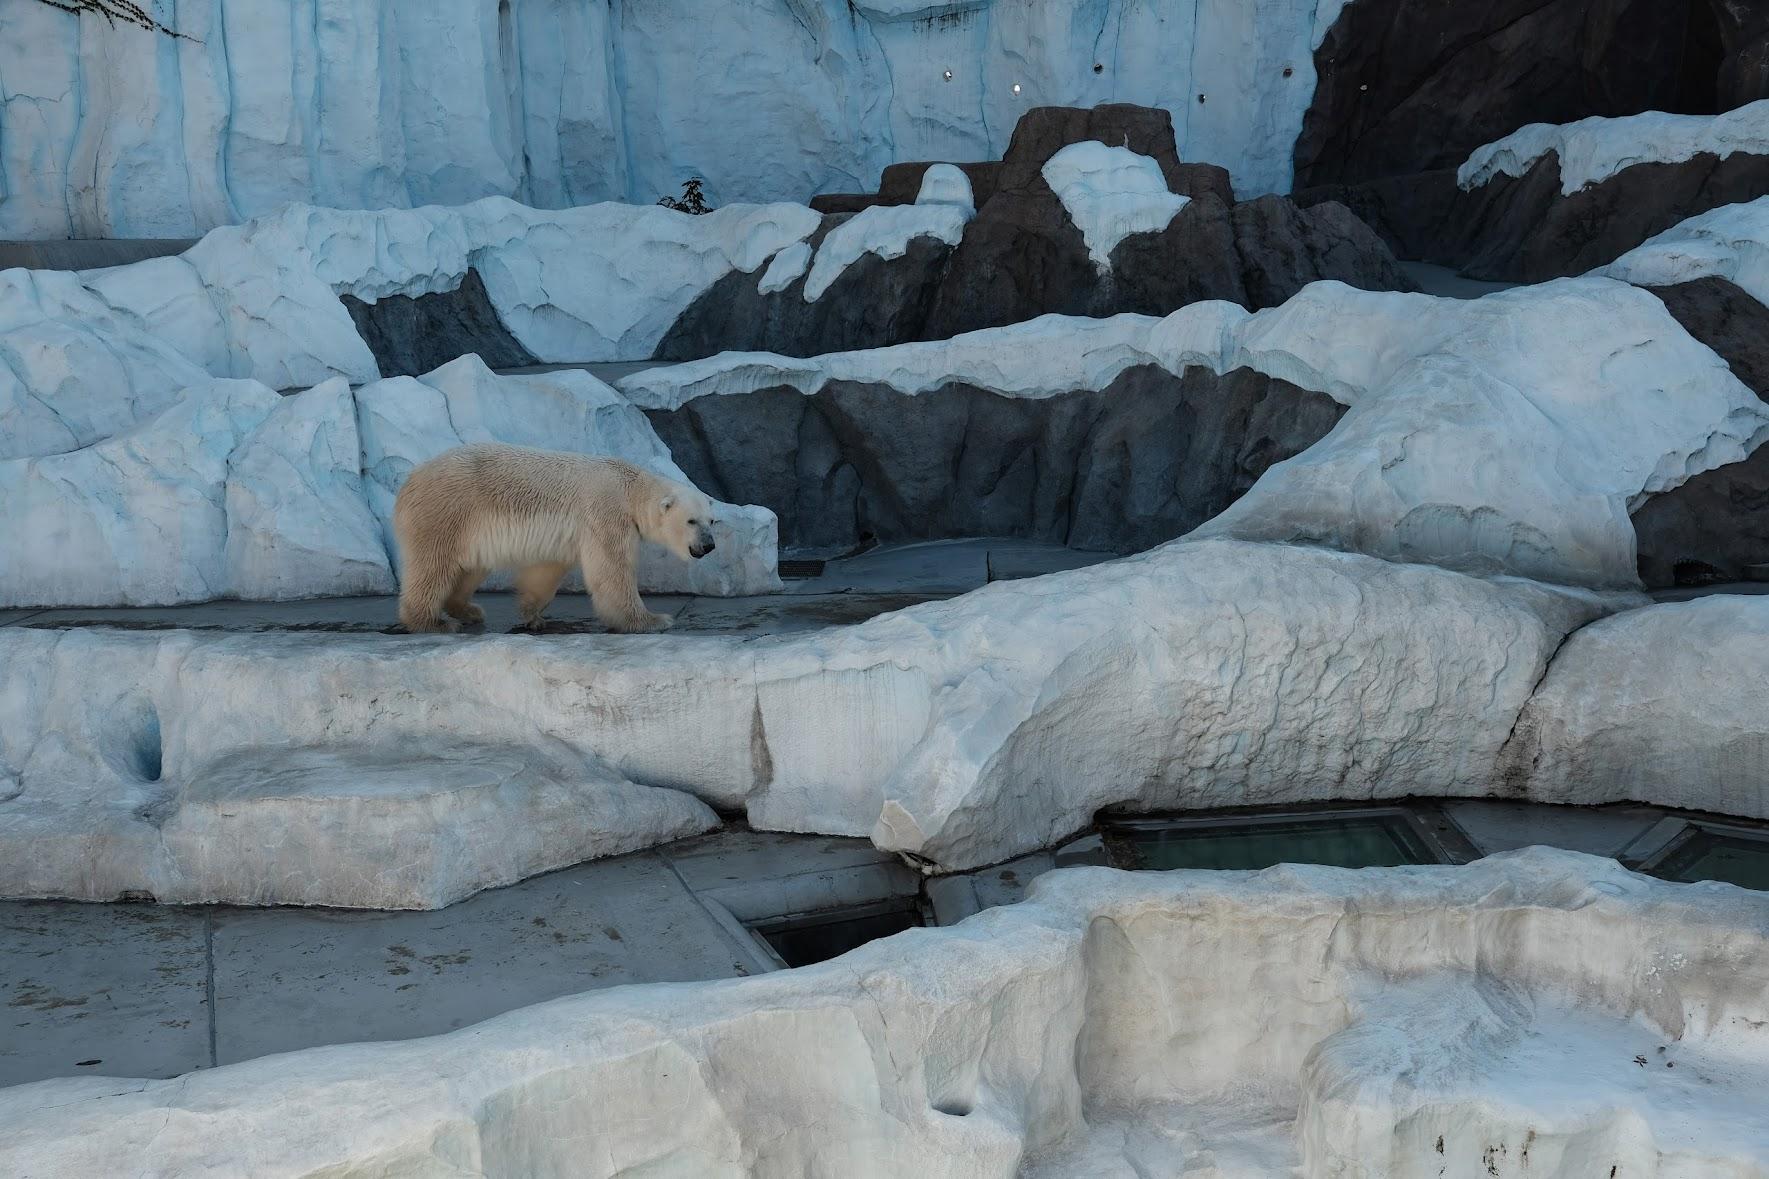 XF23㎜で撮った上野動物園の白熊